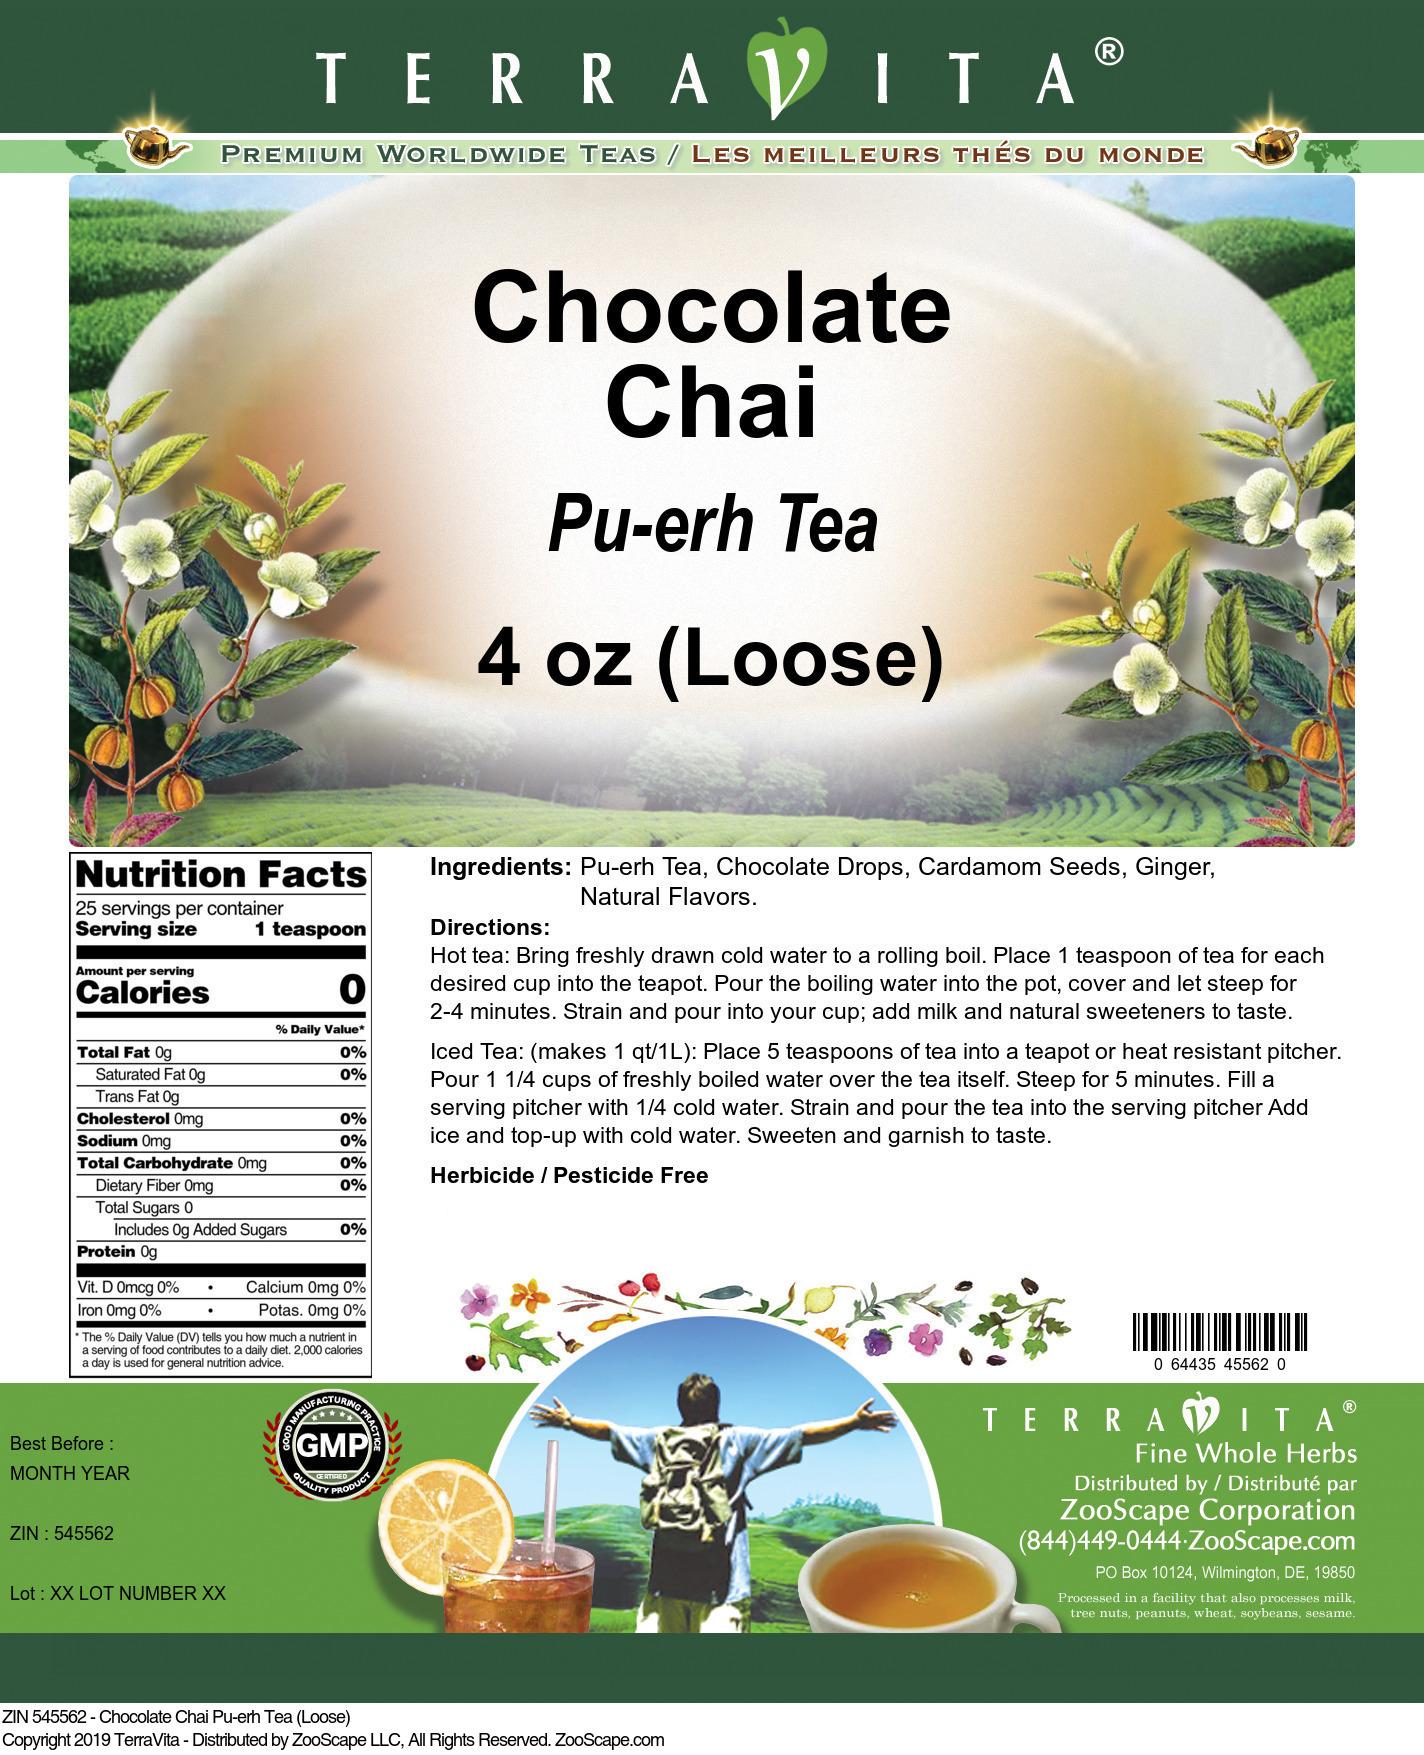 Chocolate Chai Pu-erh Tea (Loose)